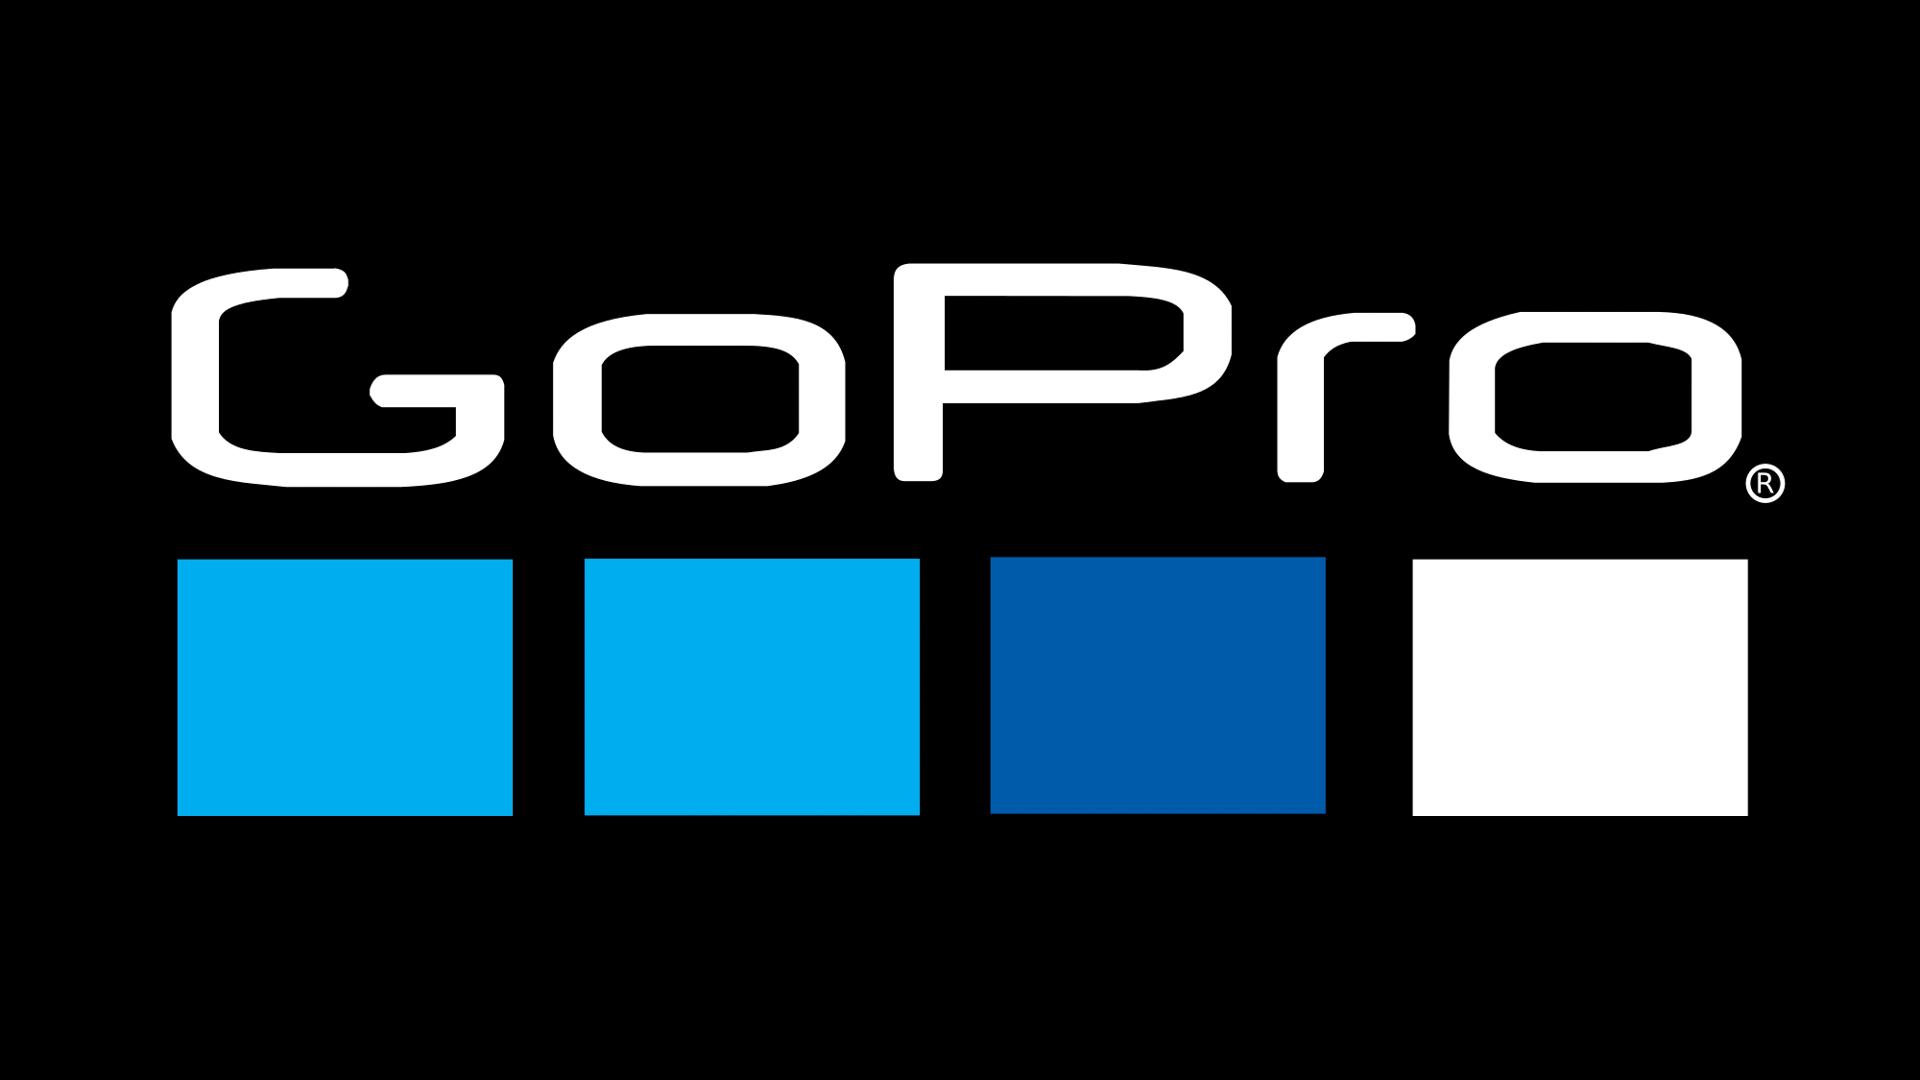 GoProロゴ